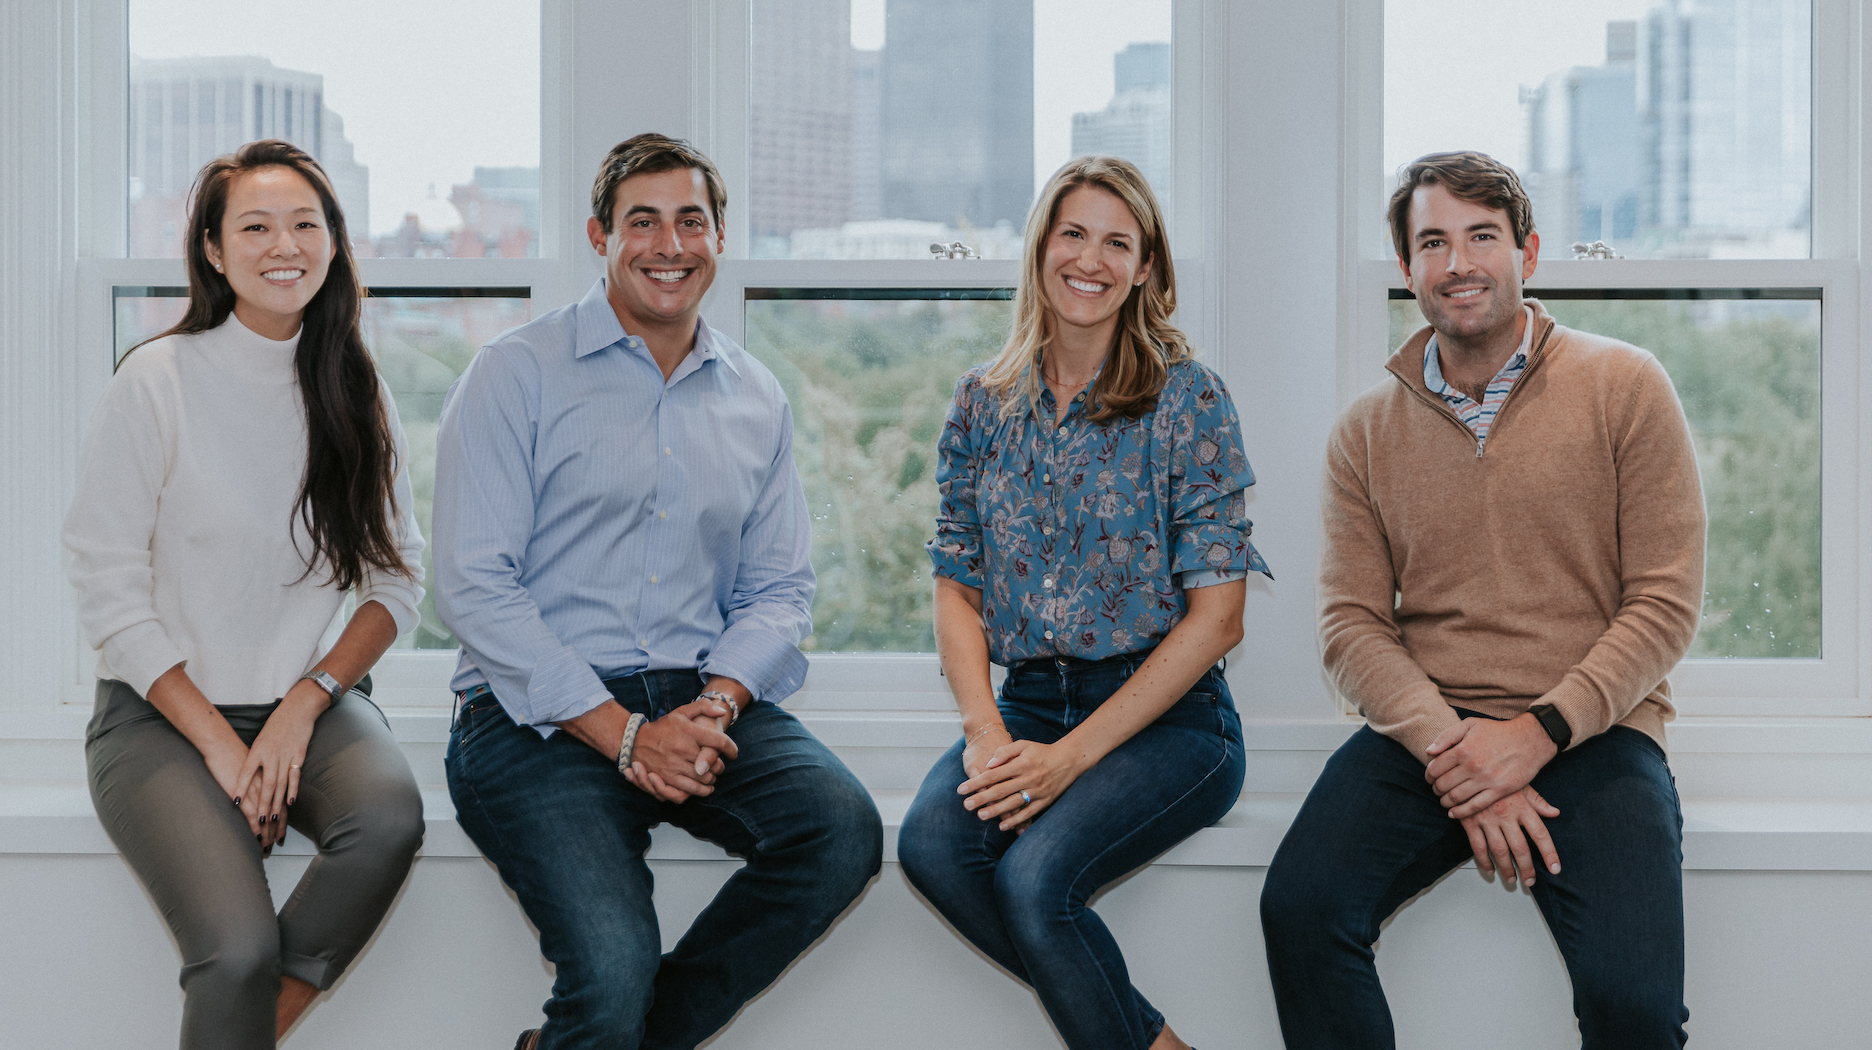 techcrunch.com - Christine Hall - Asymmetric Capital Partners hits ground running with $105M debut fund targeting B2B startups